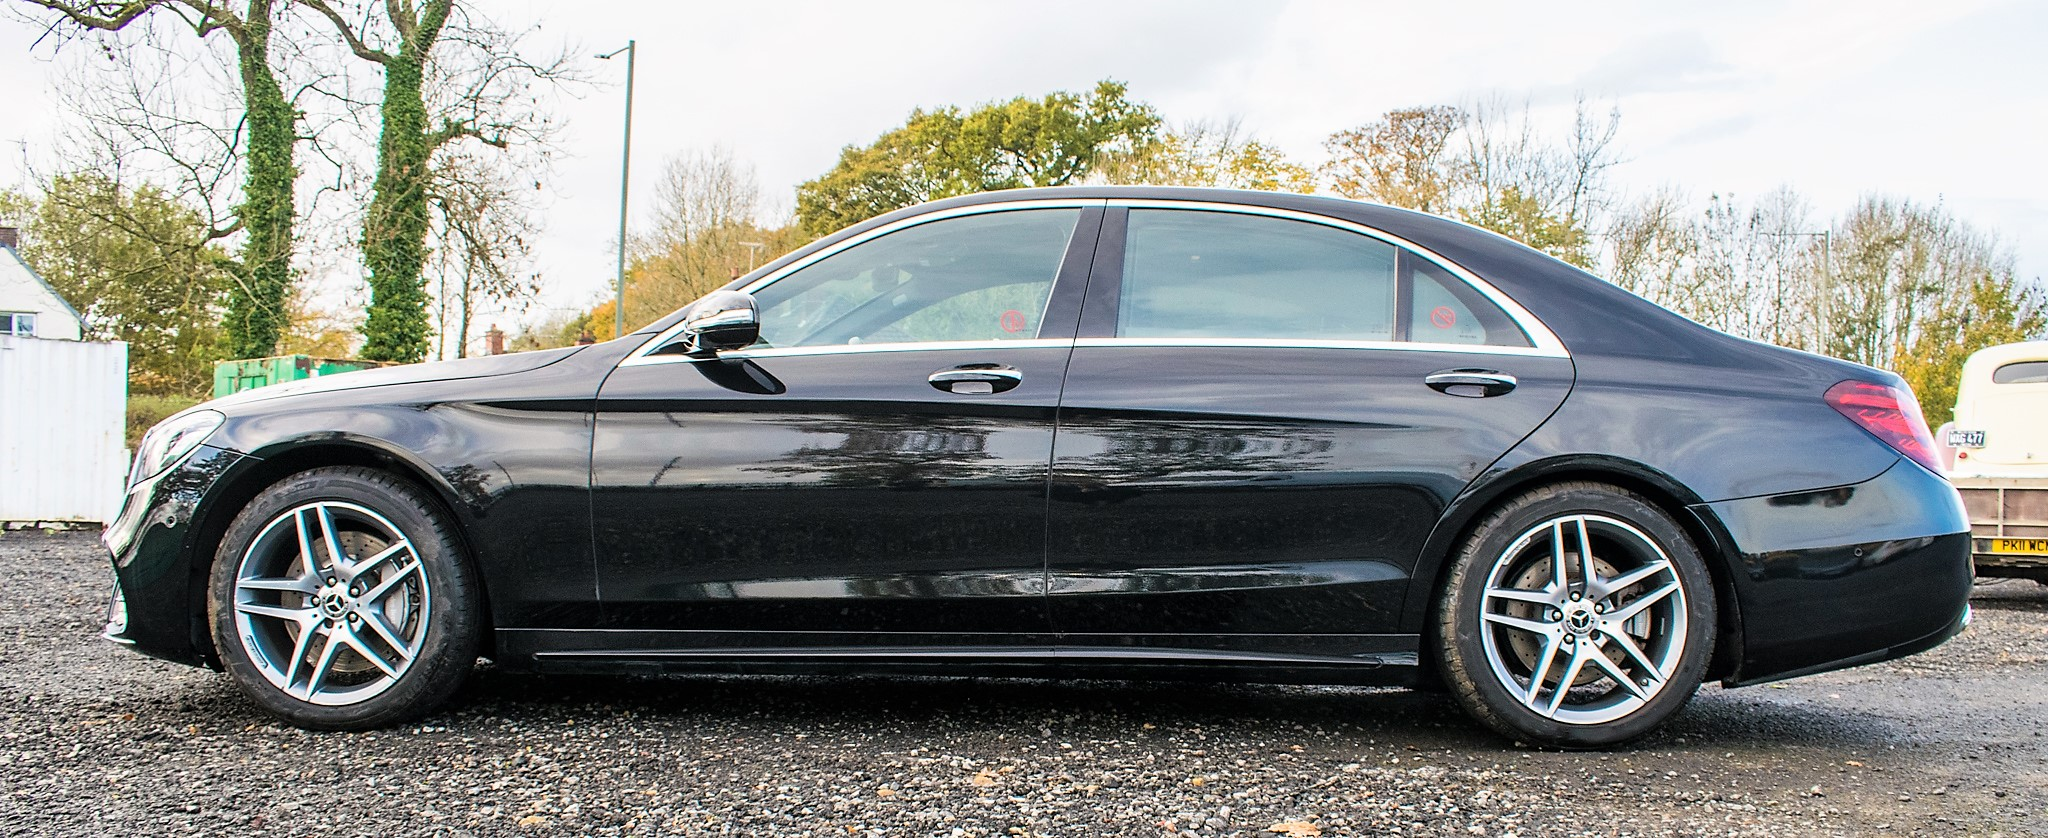 Mercedes Benz S450 L AMG Line Executive auto petrol 4 door saloon car Registration Number: FX68 - Image 8 of 33